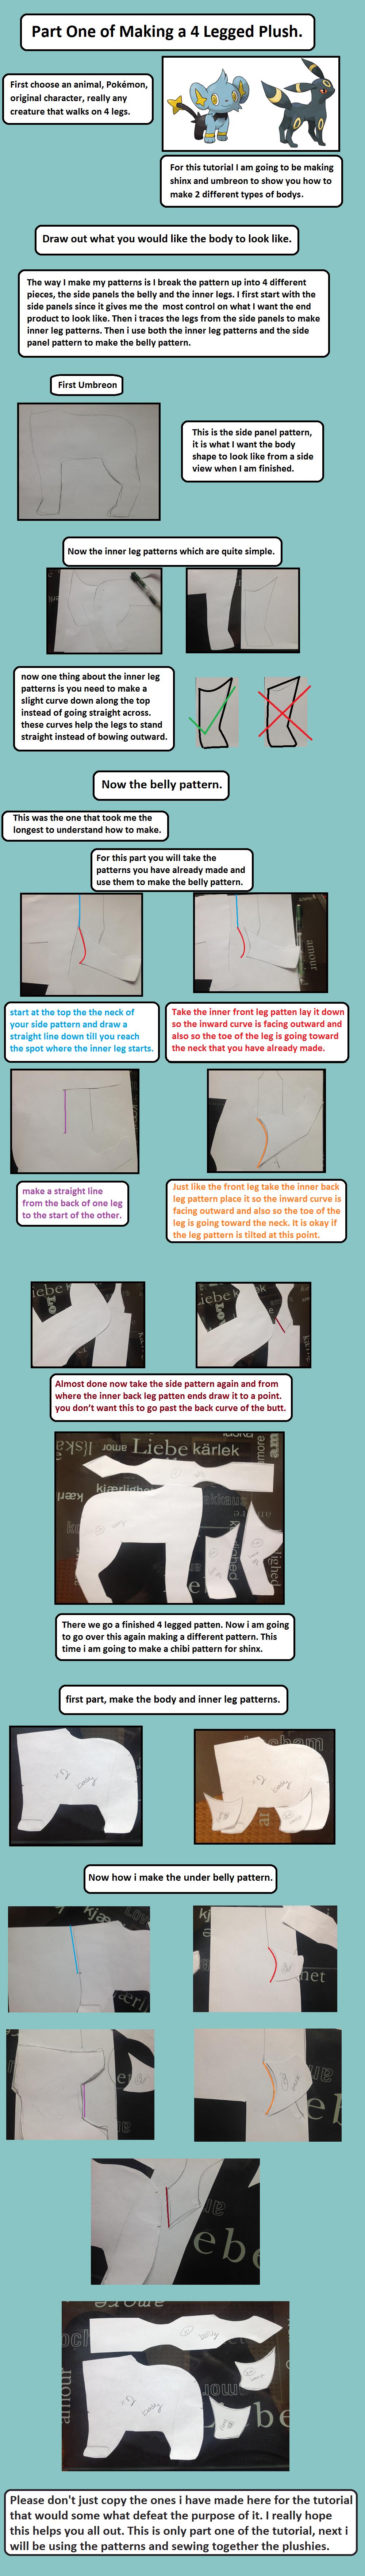 4 legged plush tutorial